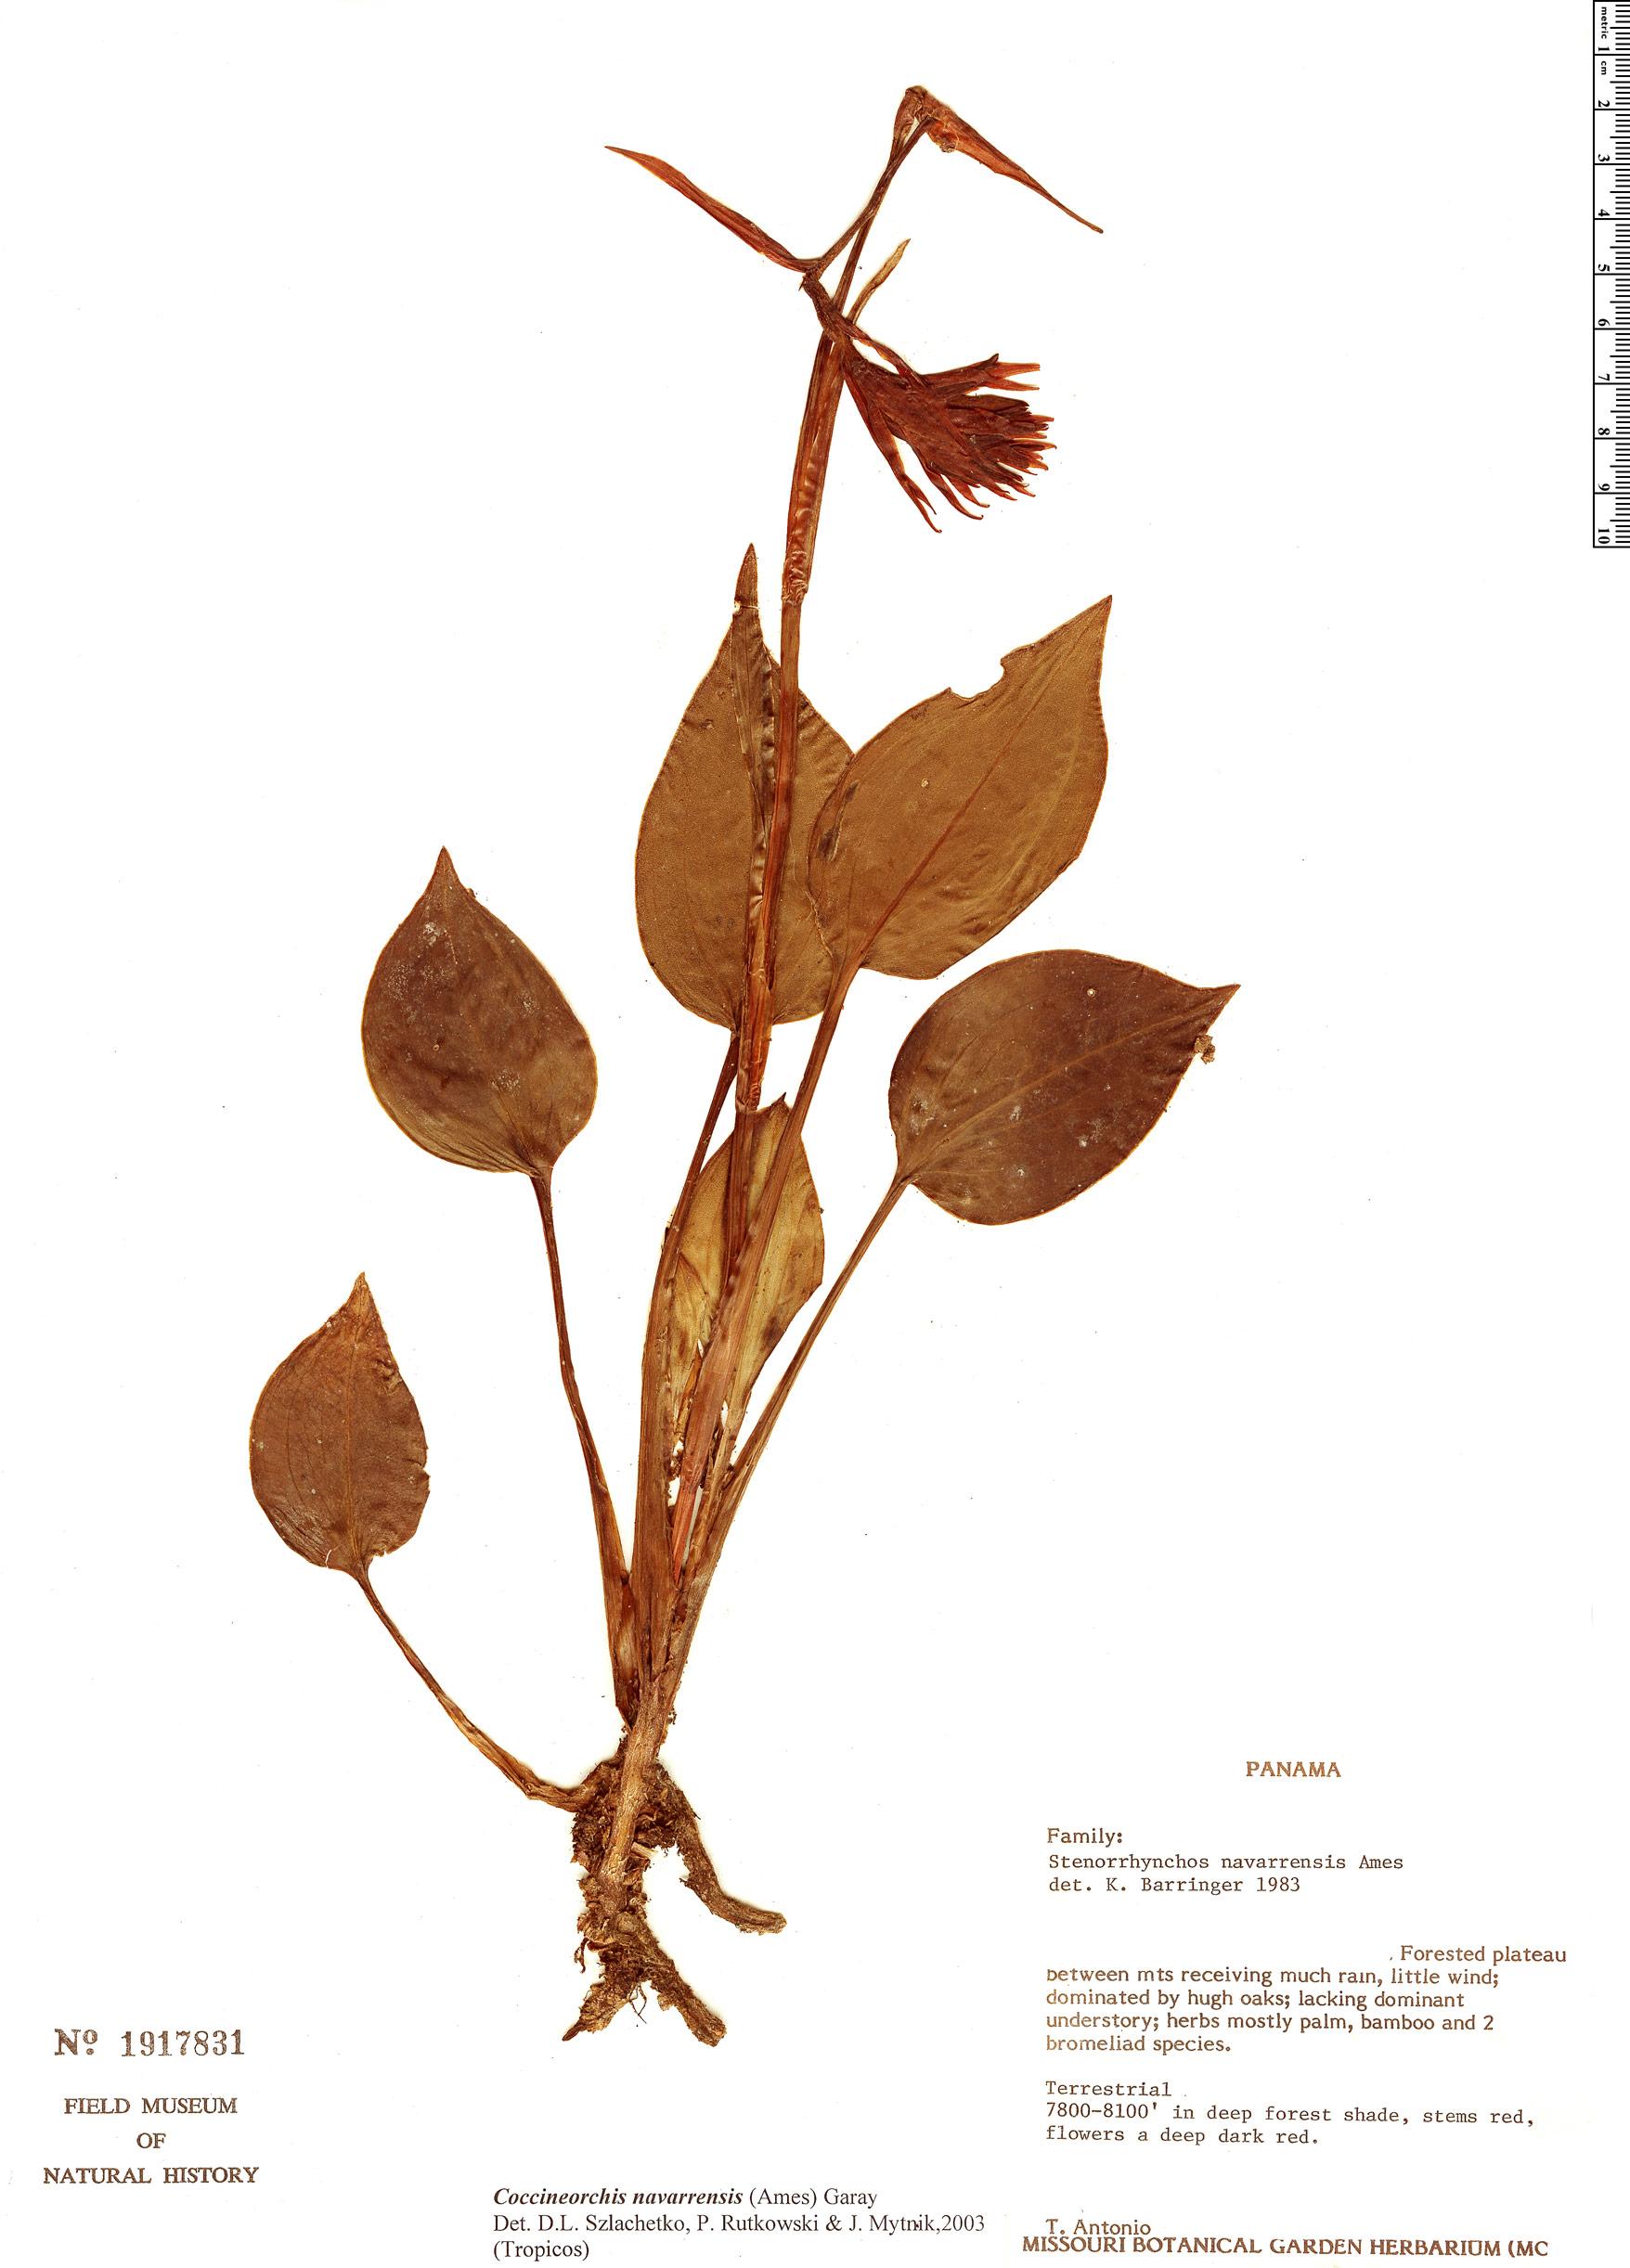 Specimen: Coccineorchis navarrensis